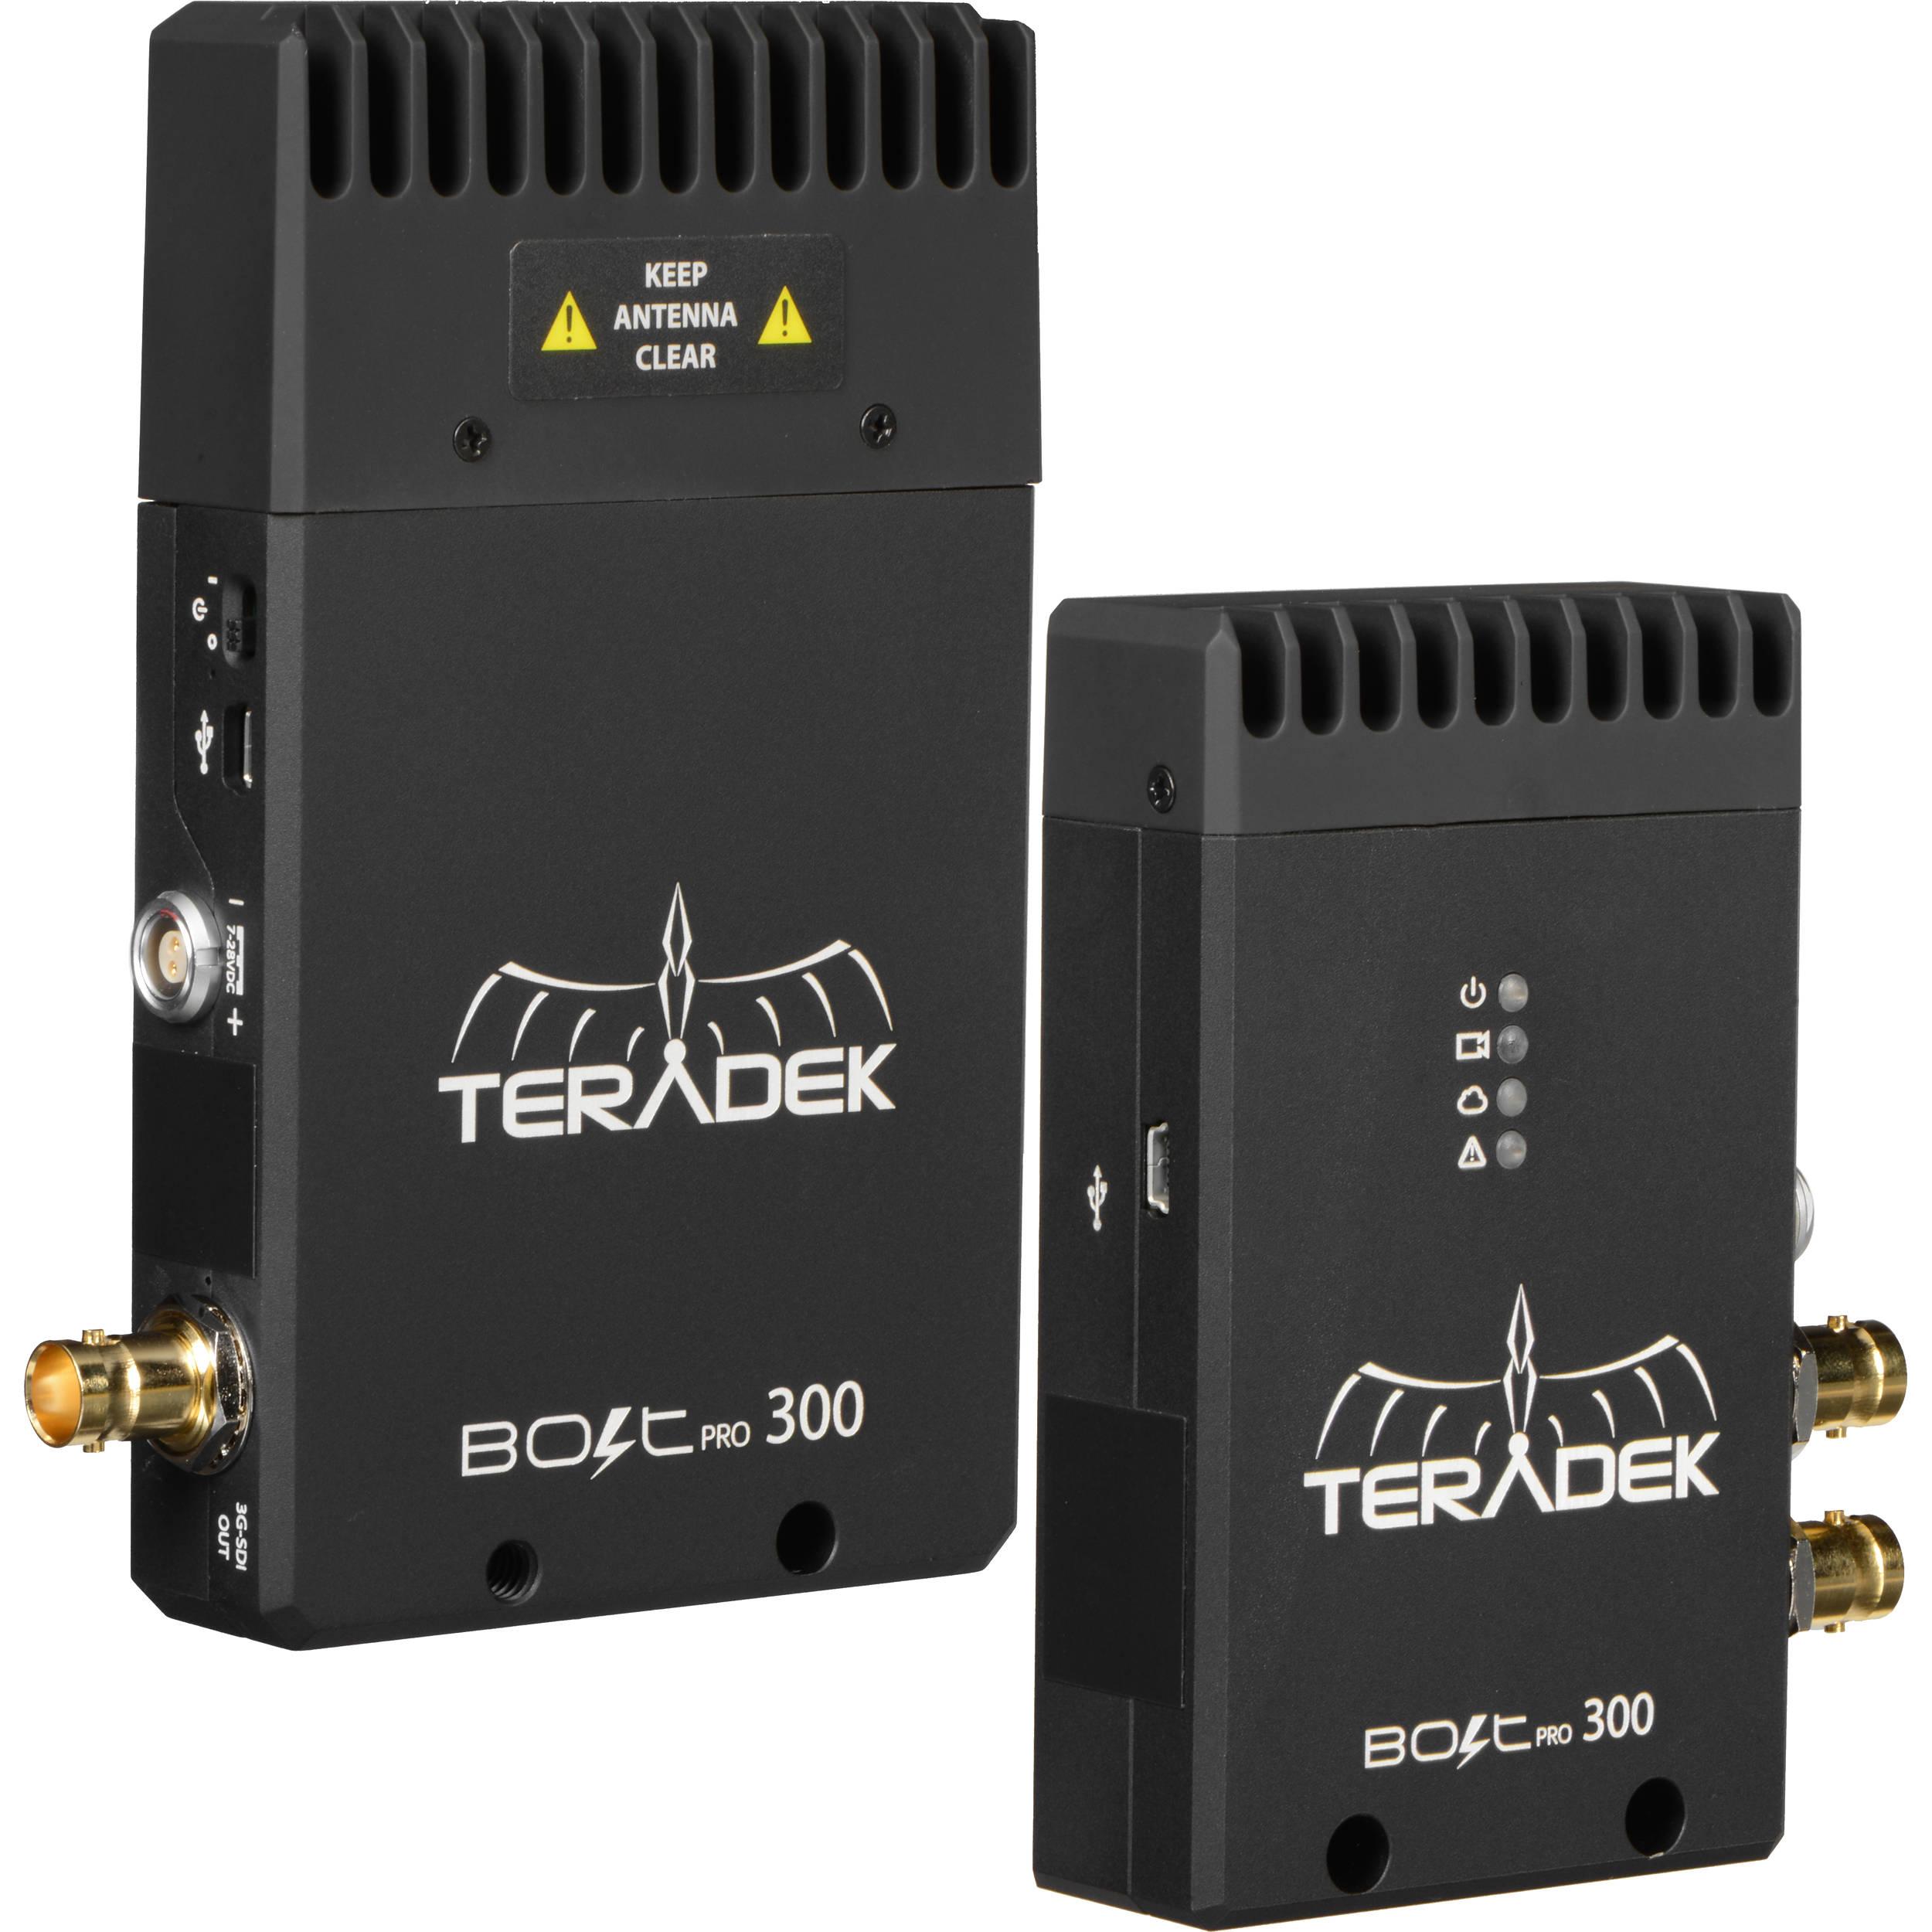 Teradek Bolt Pro Wireless SDI Video Transmission system